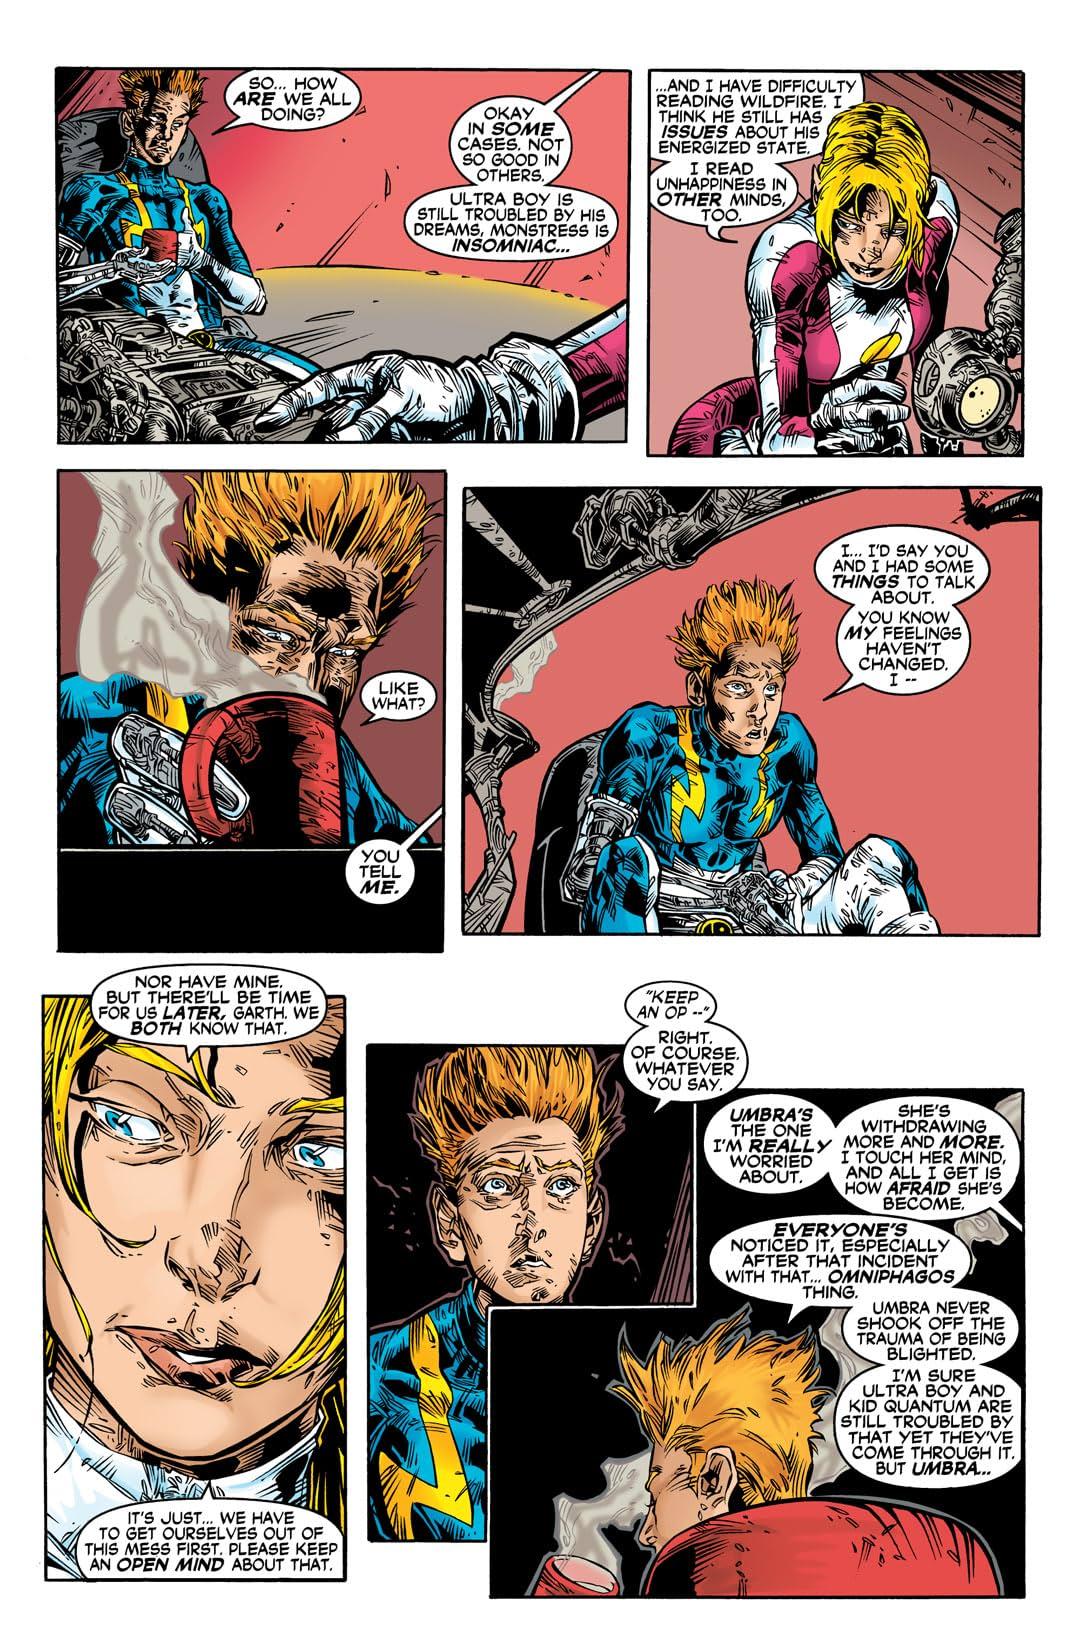 Legion Lost (2000-2001) #6 (of 12)